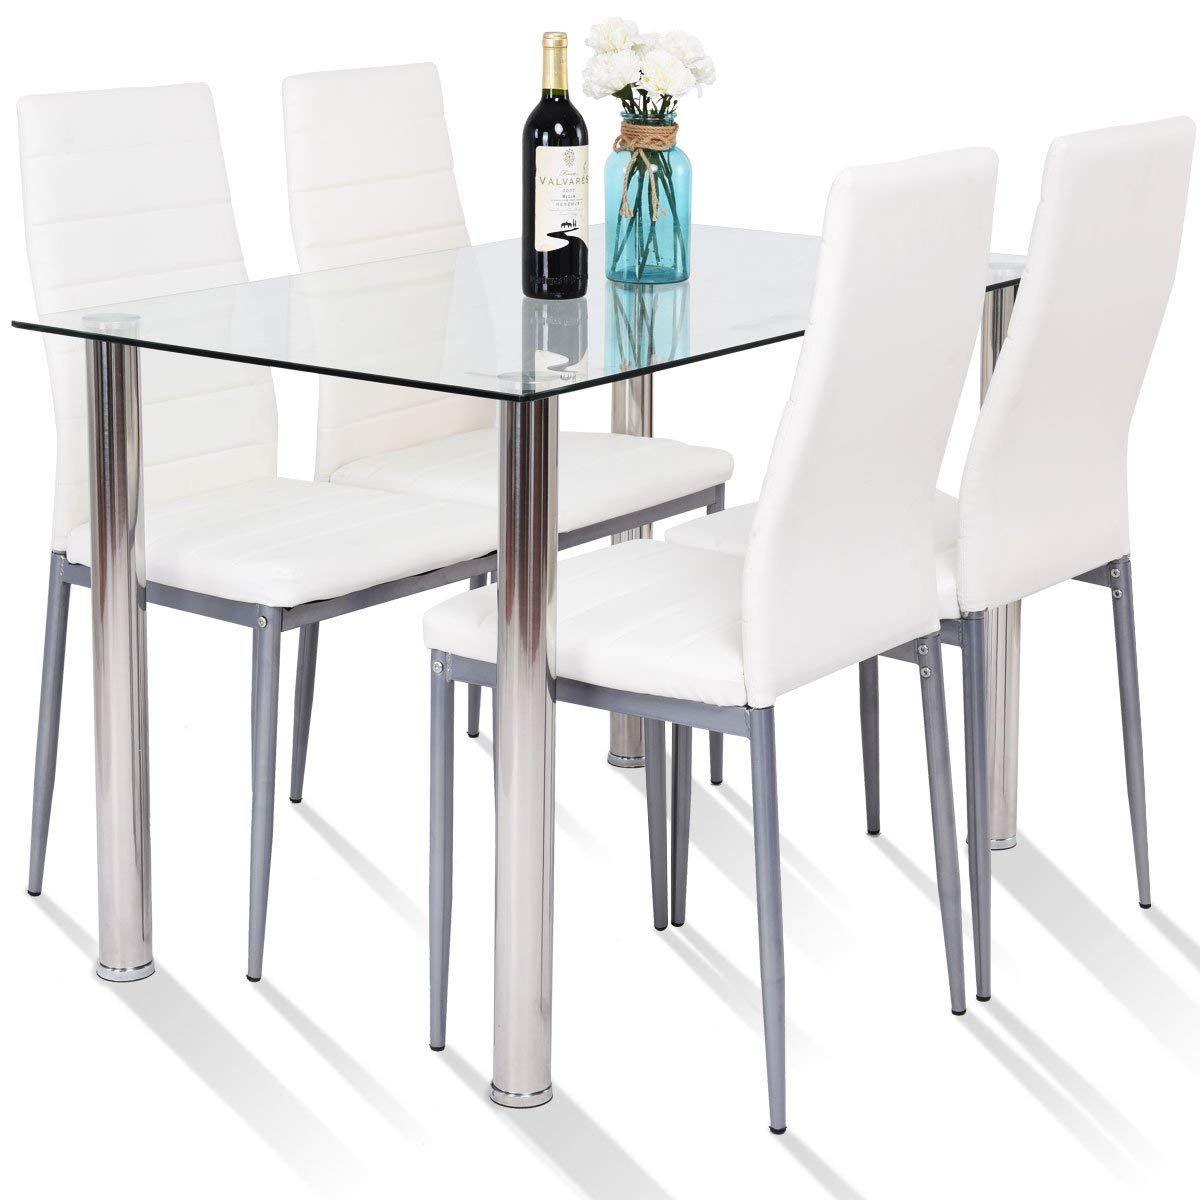 Amazoncom Tangkula 5 Pcs Dining Table Set Modern Tempered Glass Kitchen Table Settings Dining Table Setting Glass Dining Table